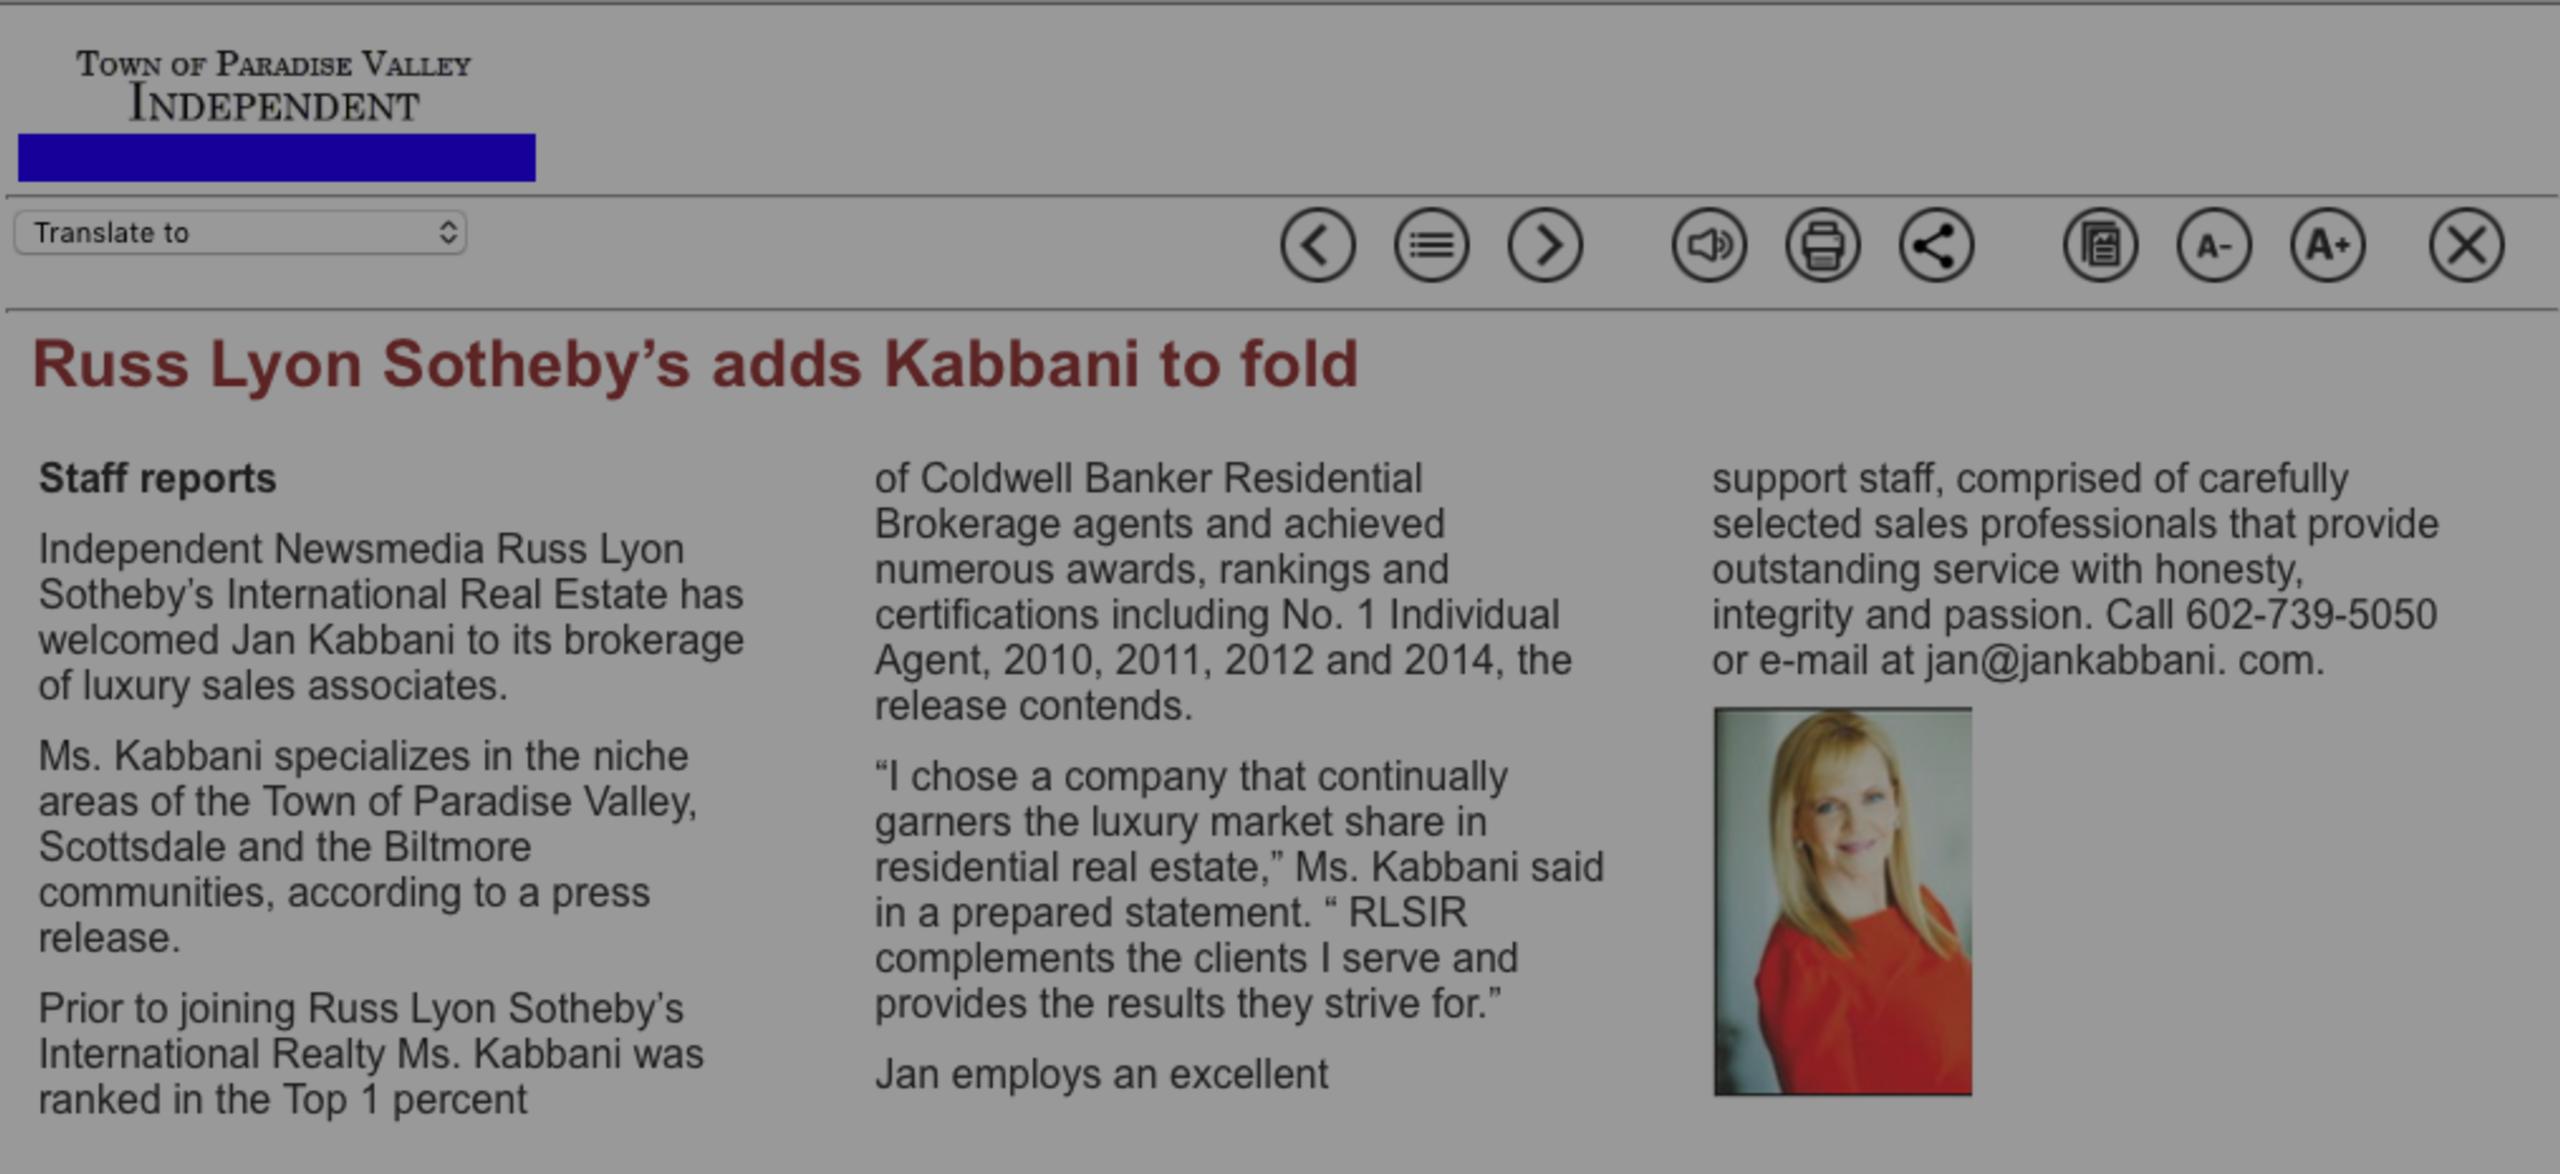 Russ Lyon Sotheby's Adds Kabbani To Fold